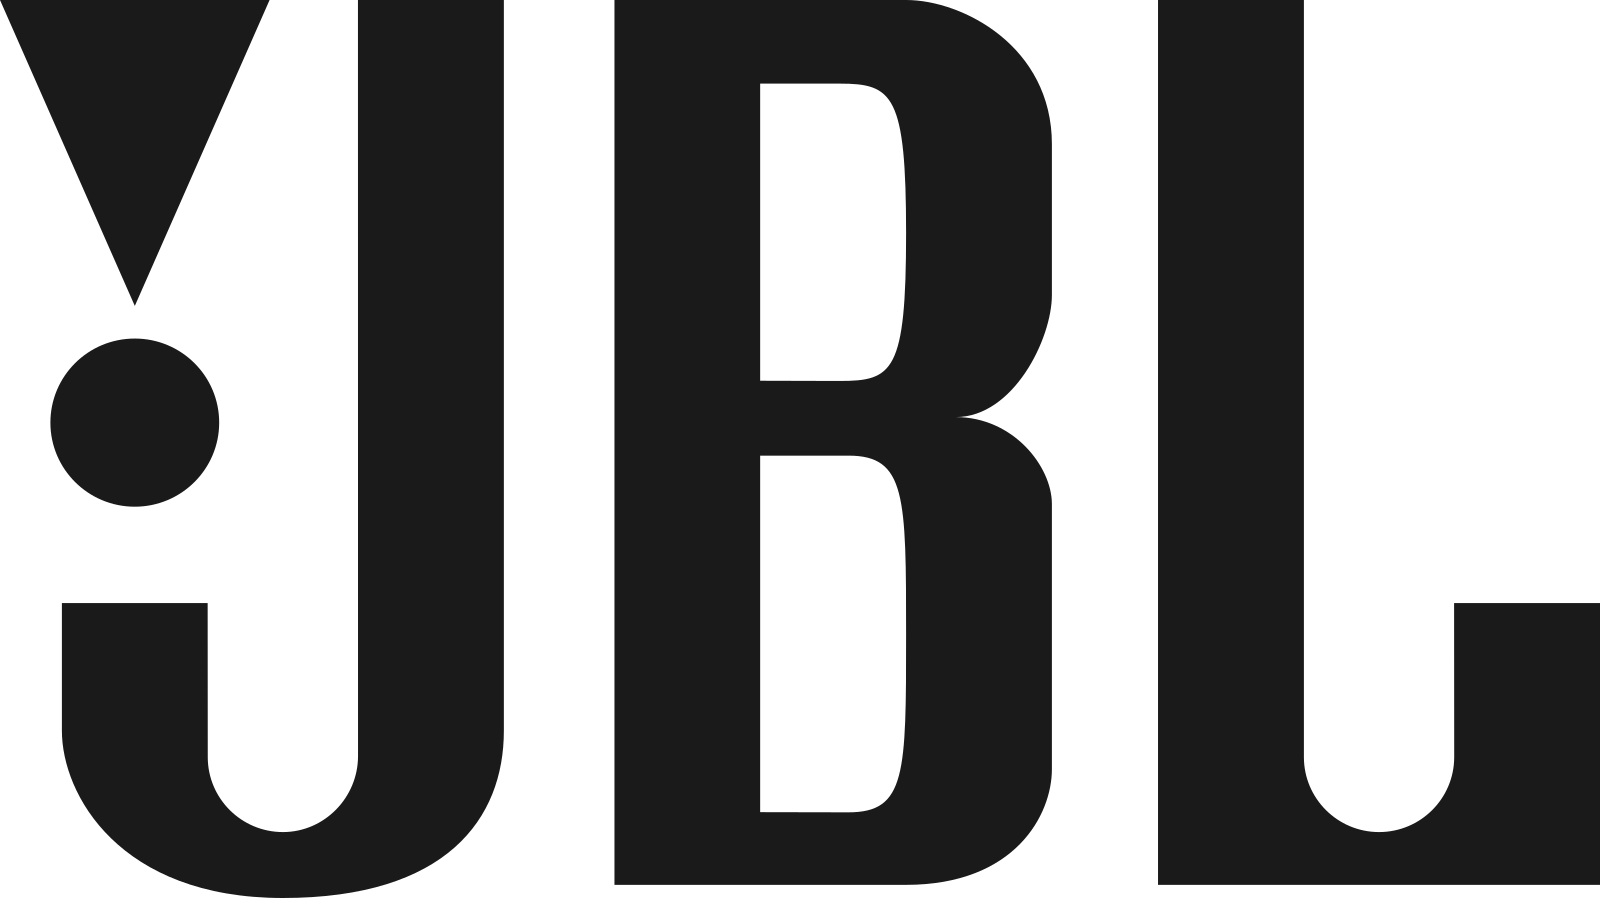 jbl-logo-9